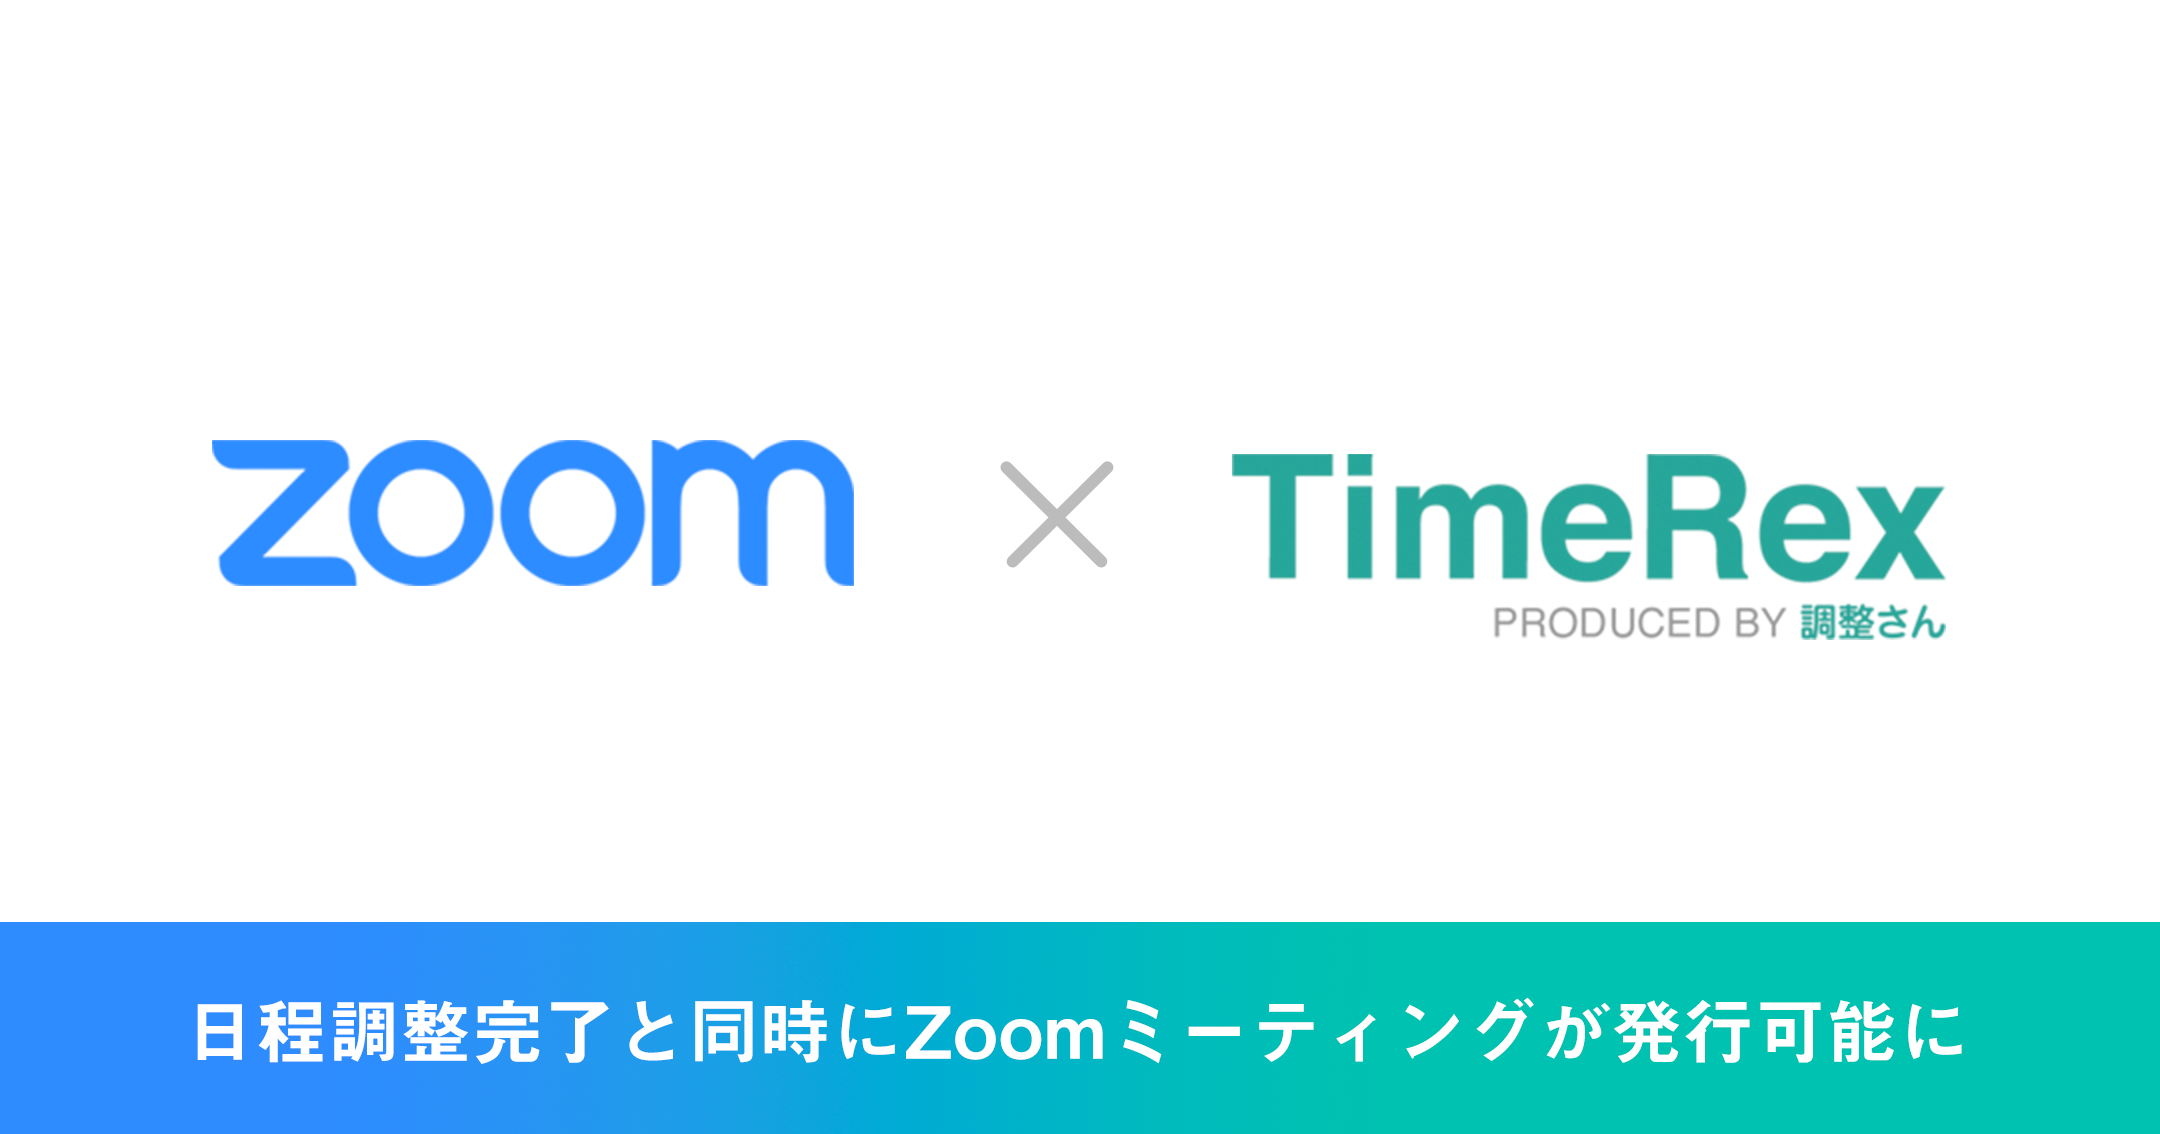 Zoom×TimeRex